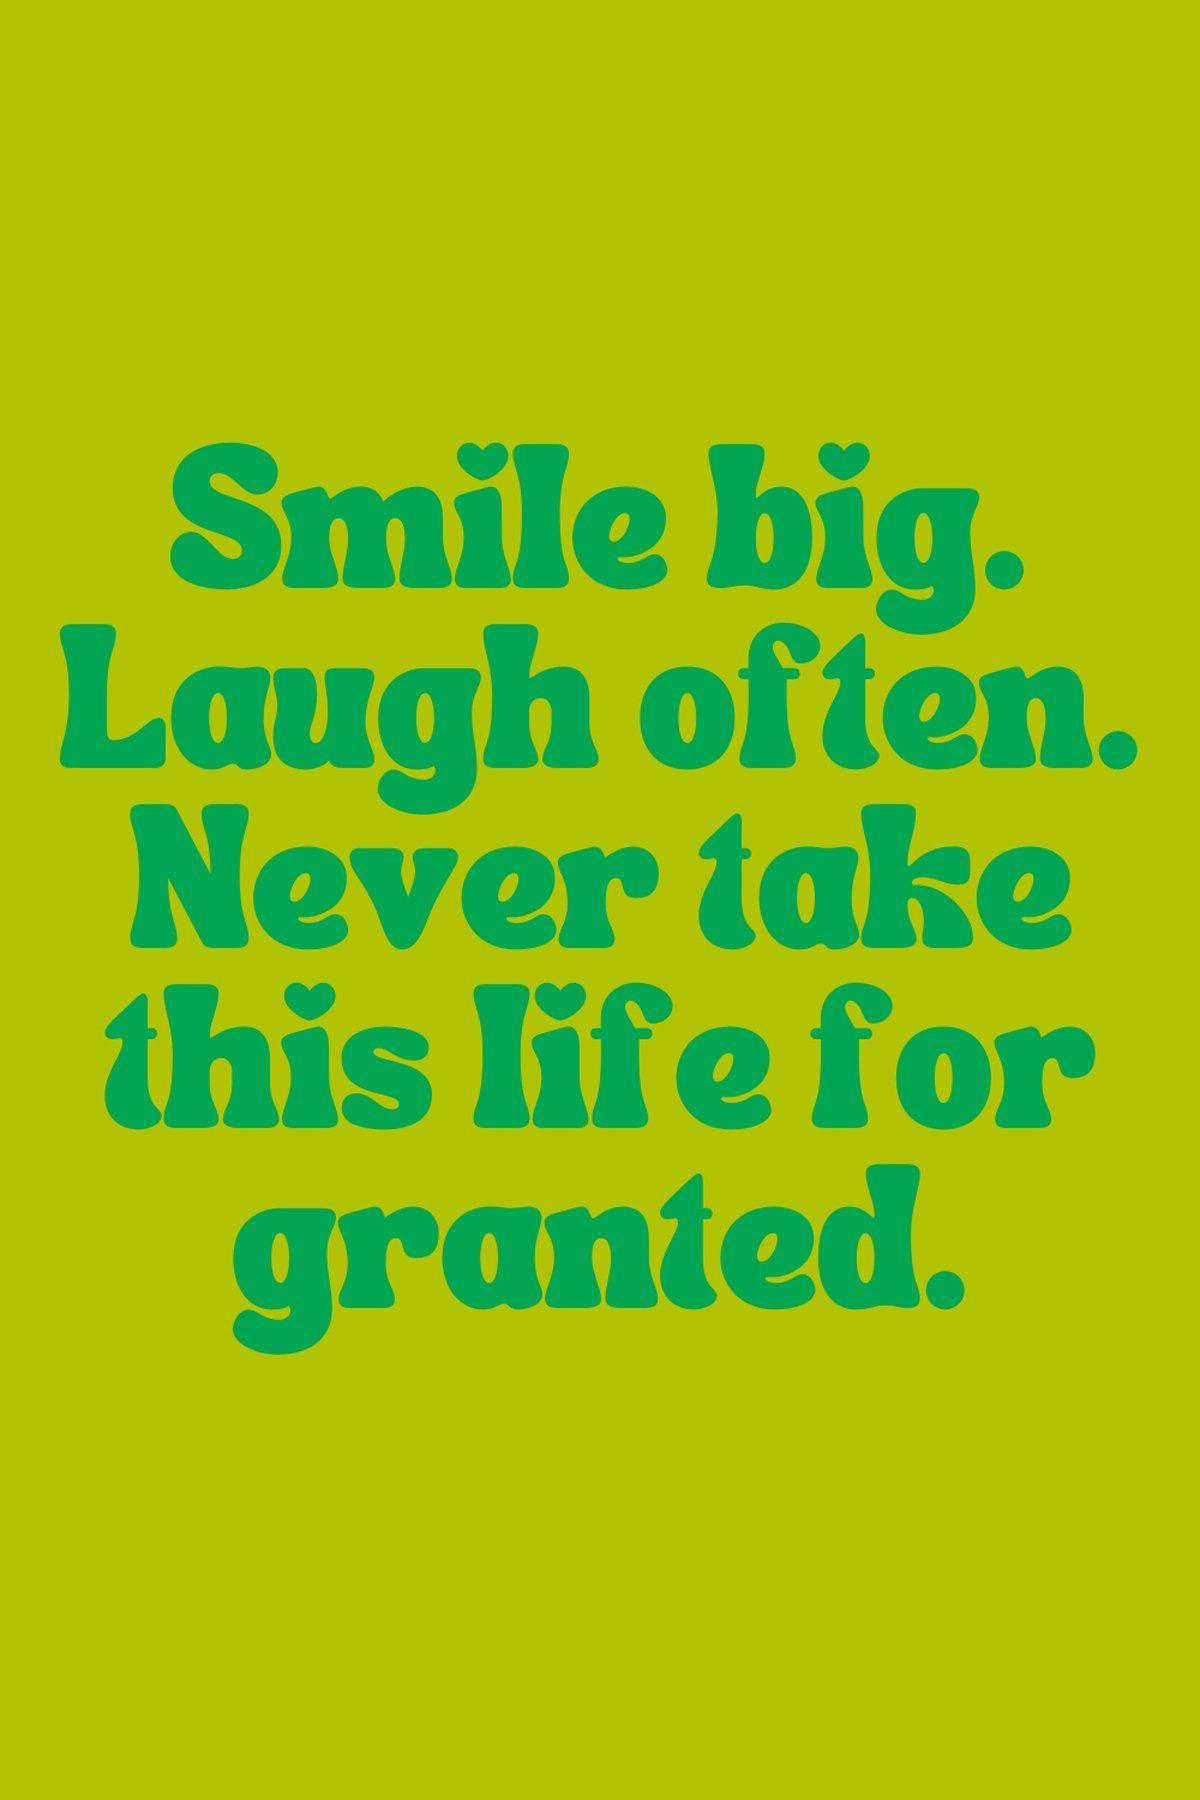 Reason to smile Sayings